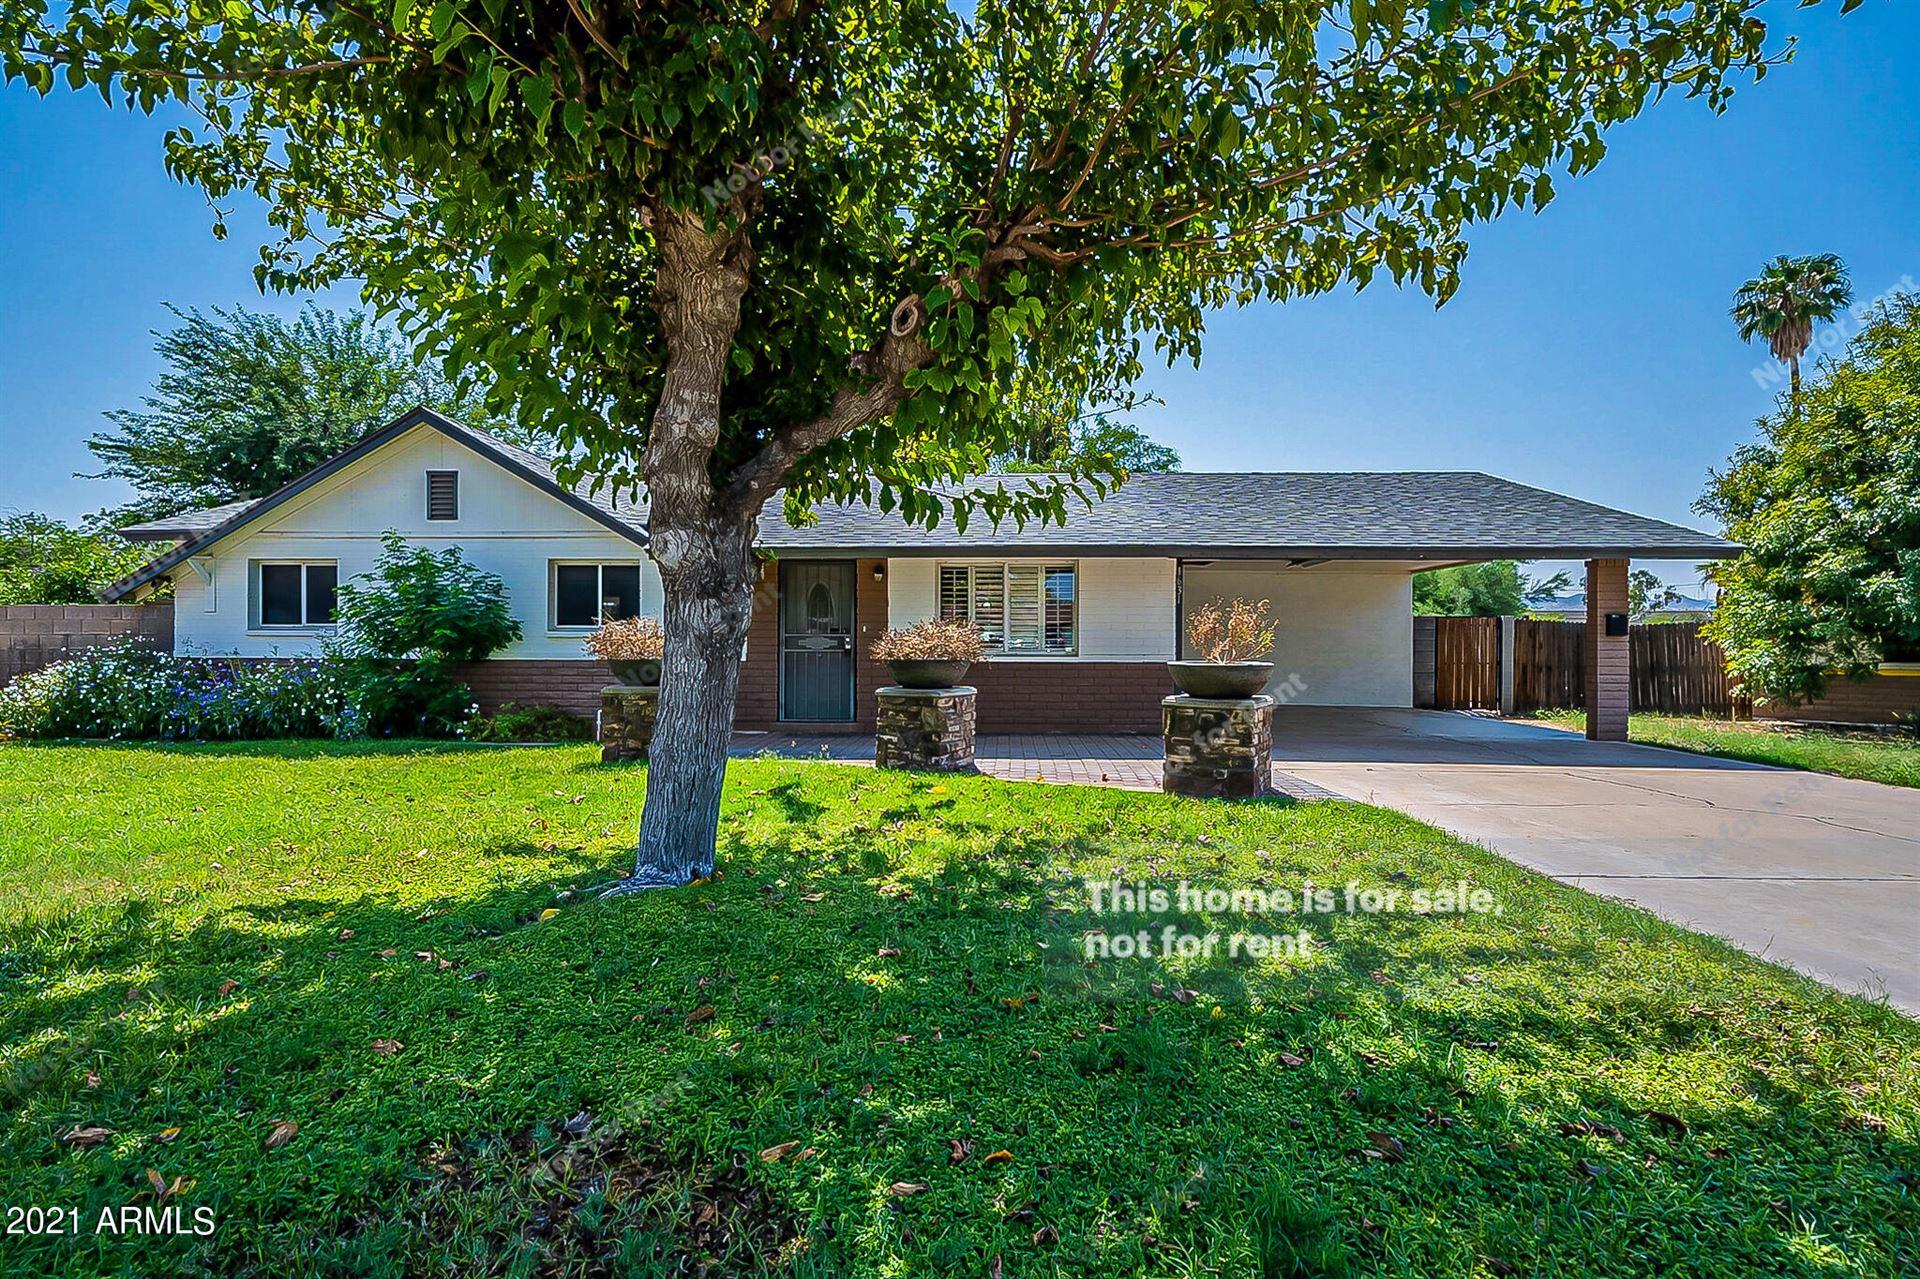 Photo of 1631 W INVERNESS Drive, Tempe, AZ 85282 (MLS # 6295211)